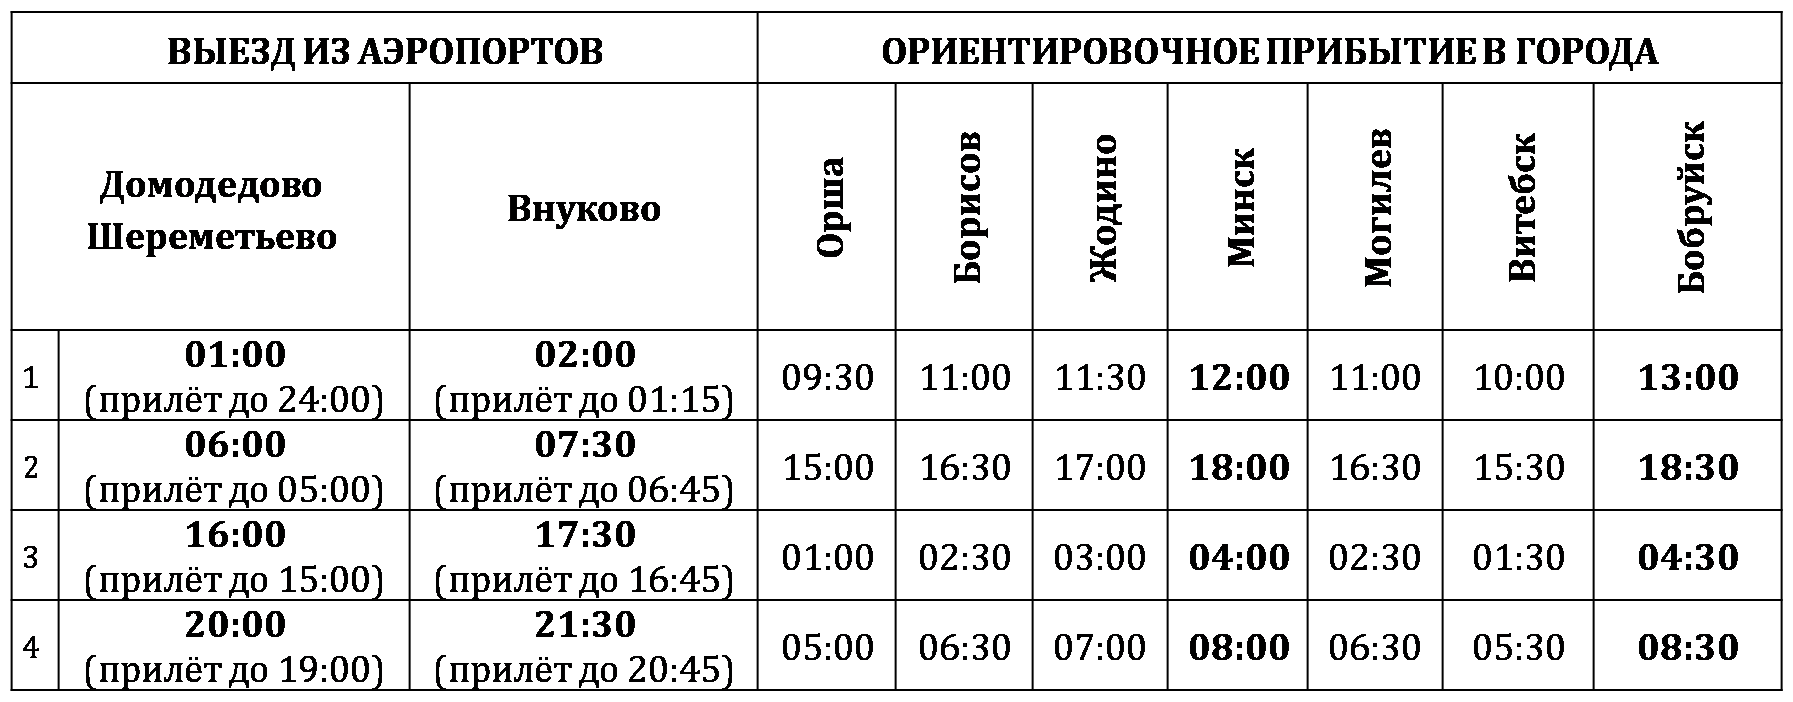 10.06.москва2 тр